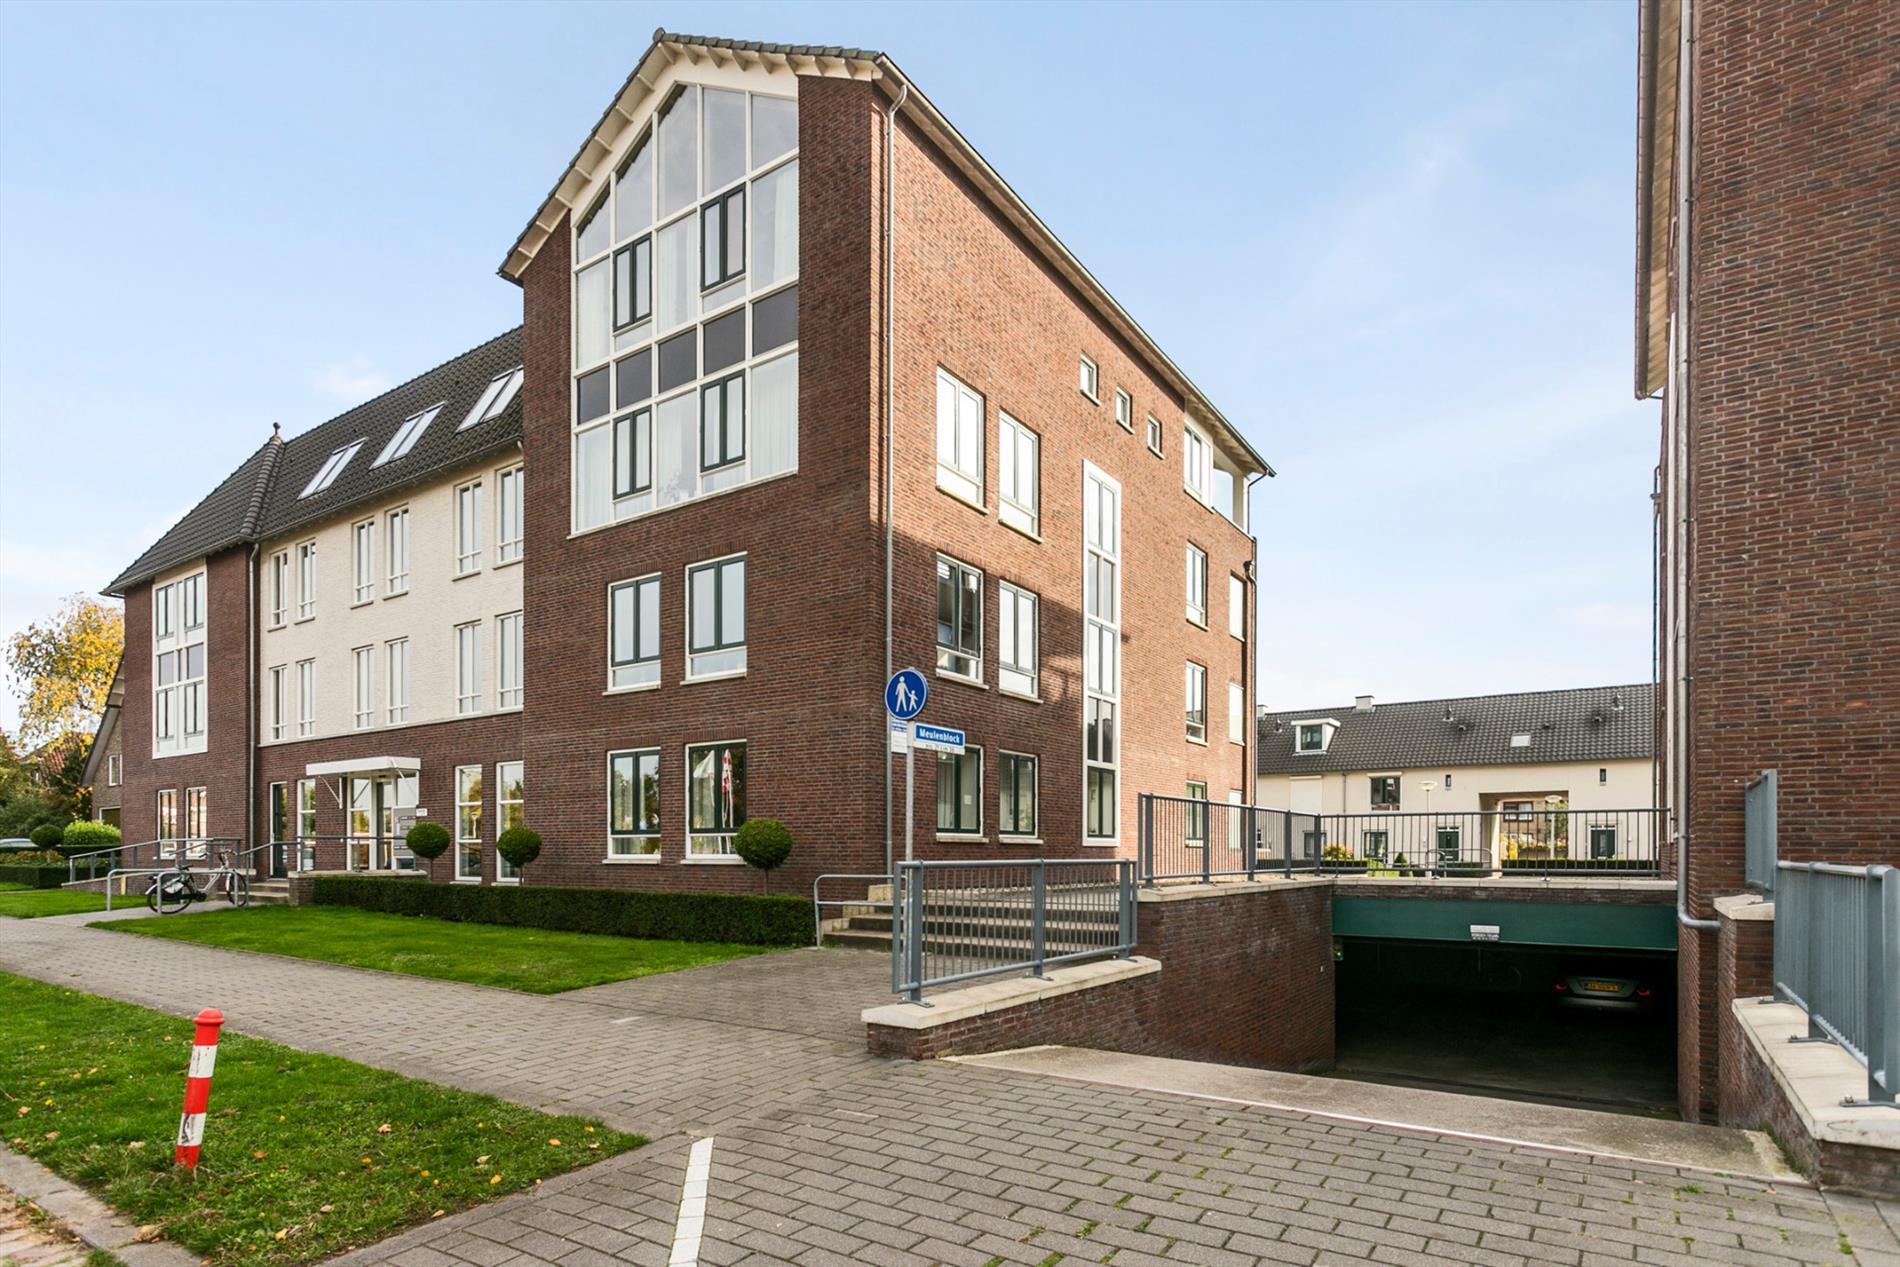 Property topphoto 1 - Meulenblock 20, 4631ZZ Hoogerheide